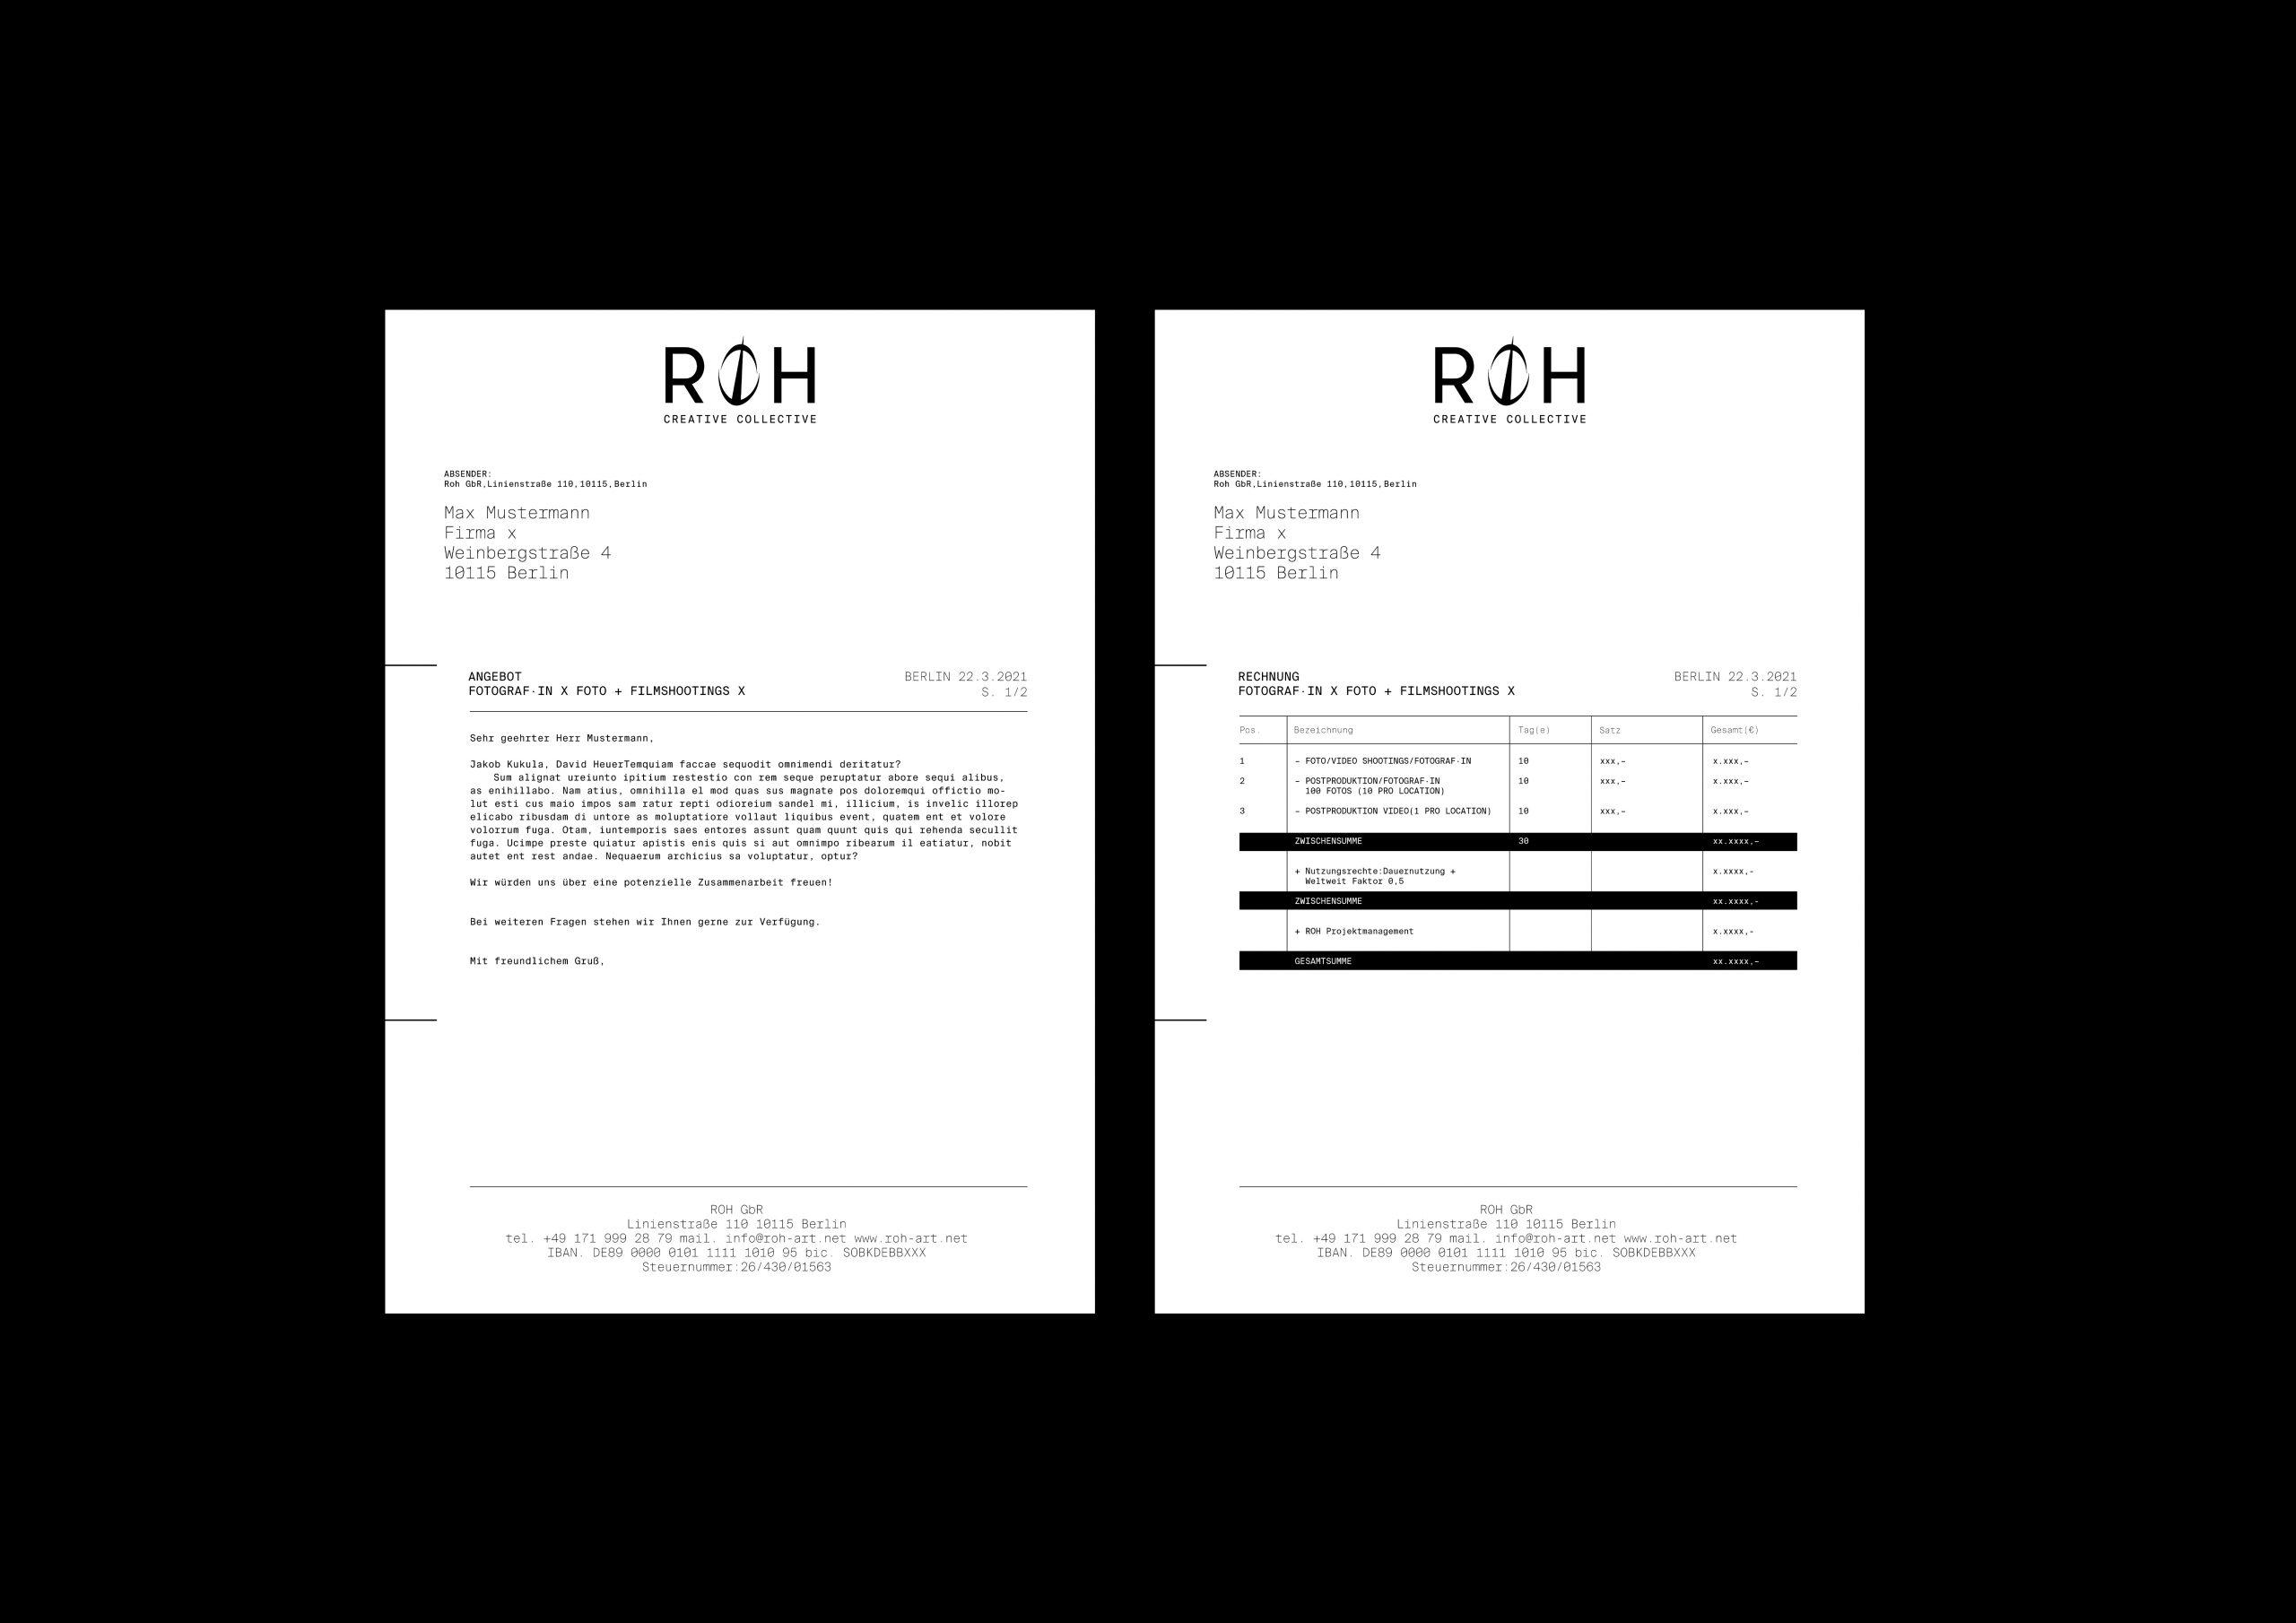 David-Heuer_ROH-Angebot-Slider2